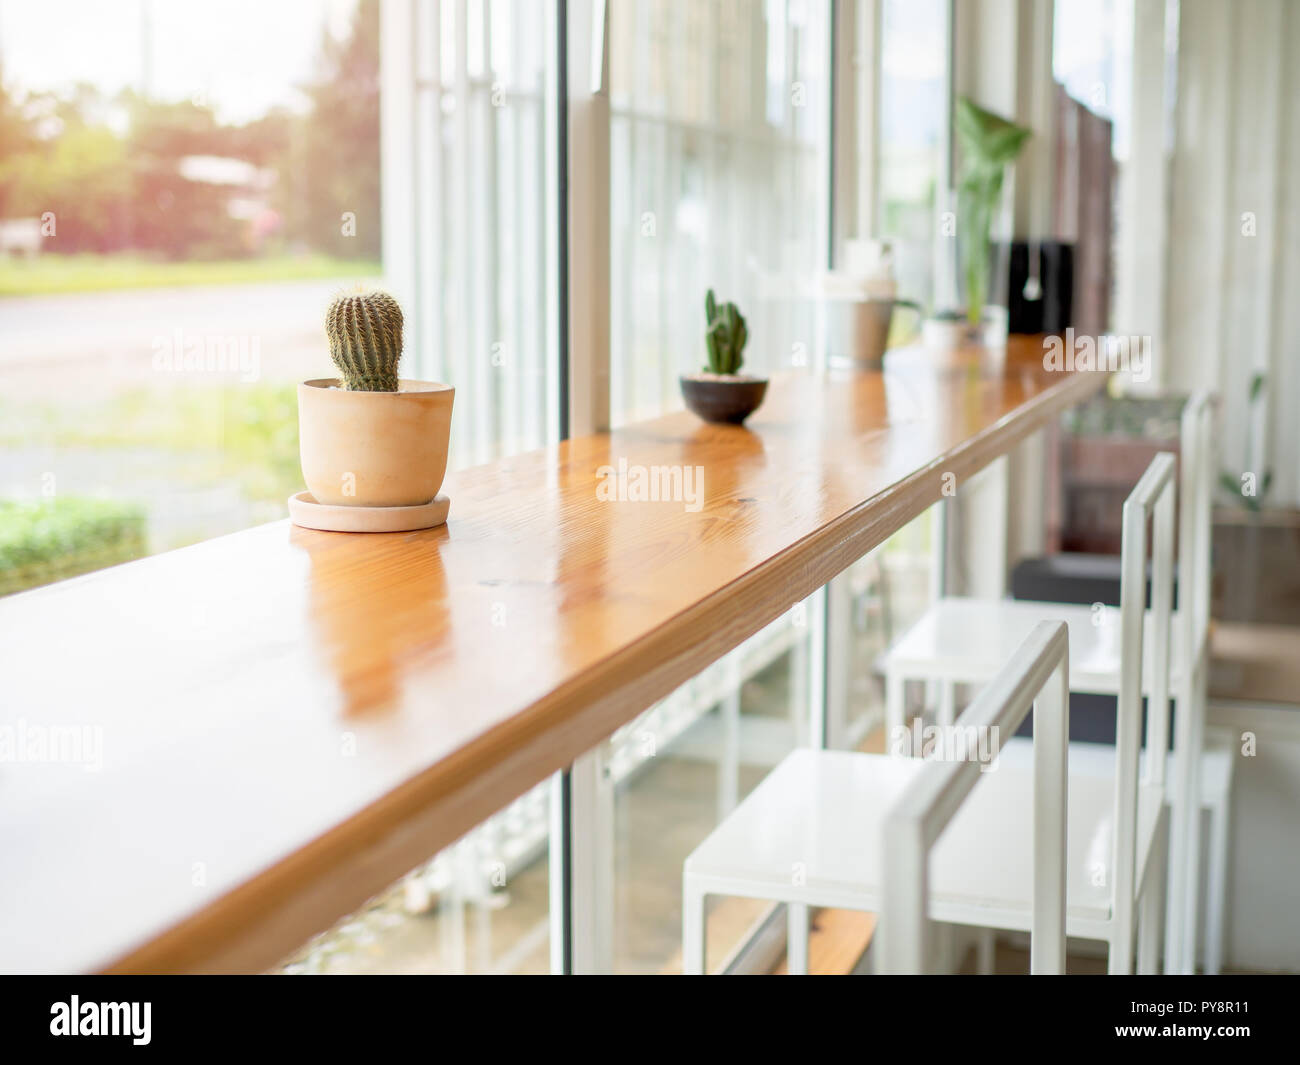 Mini Bancone Bar | Emejing Cucina Con Bancone Bar Images House Interior